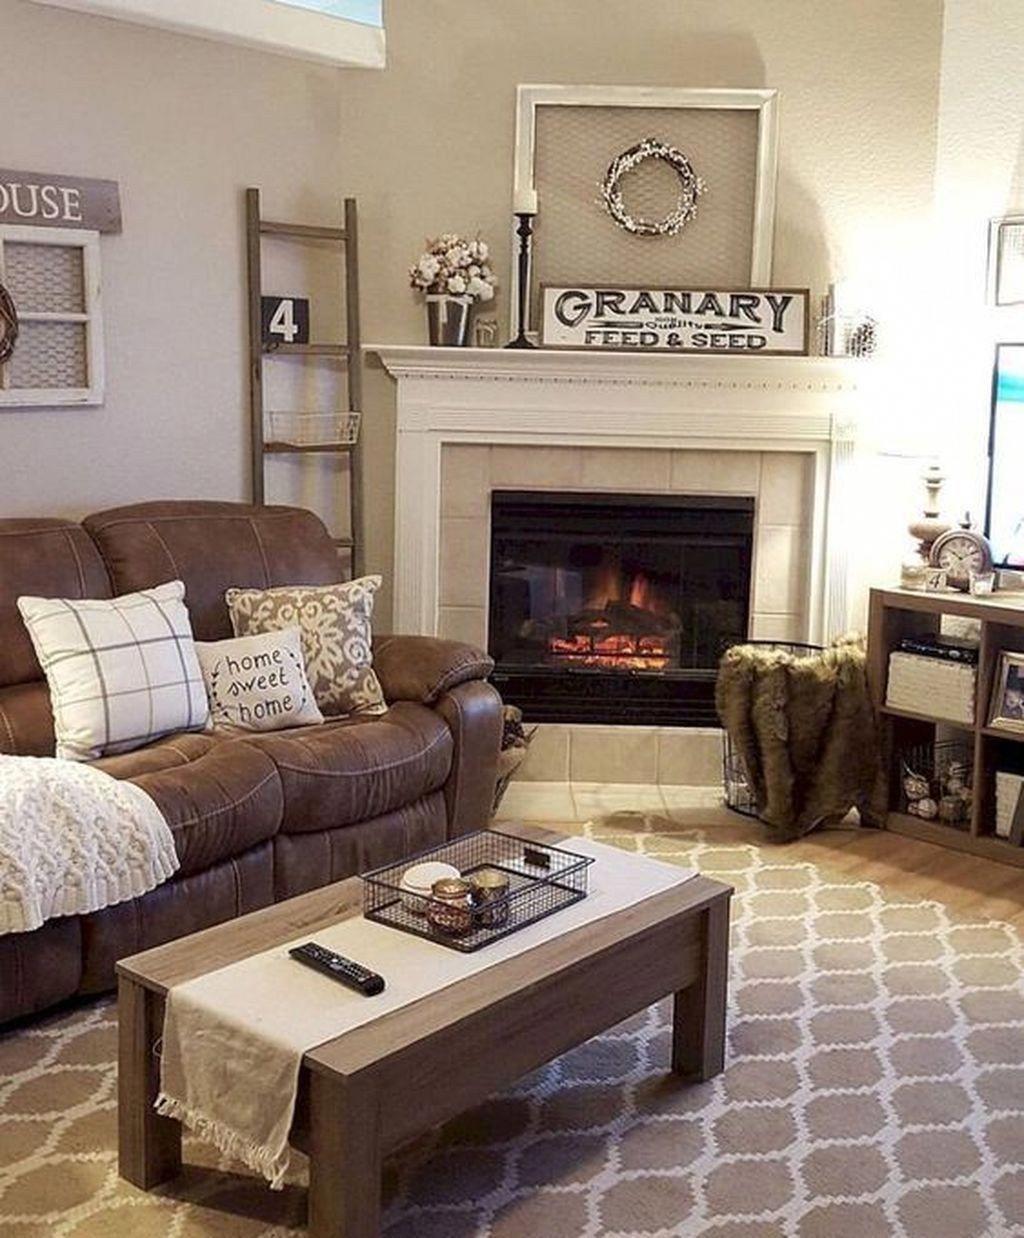 46 Cozy Living Room Ideas And Designs For 2019: 46 Cozy Farmhouse Living Room Decor Ideas That Make You